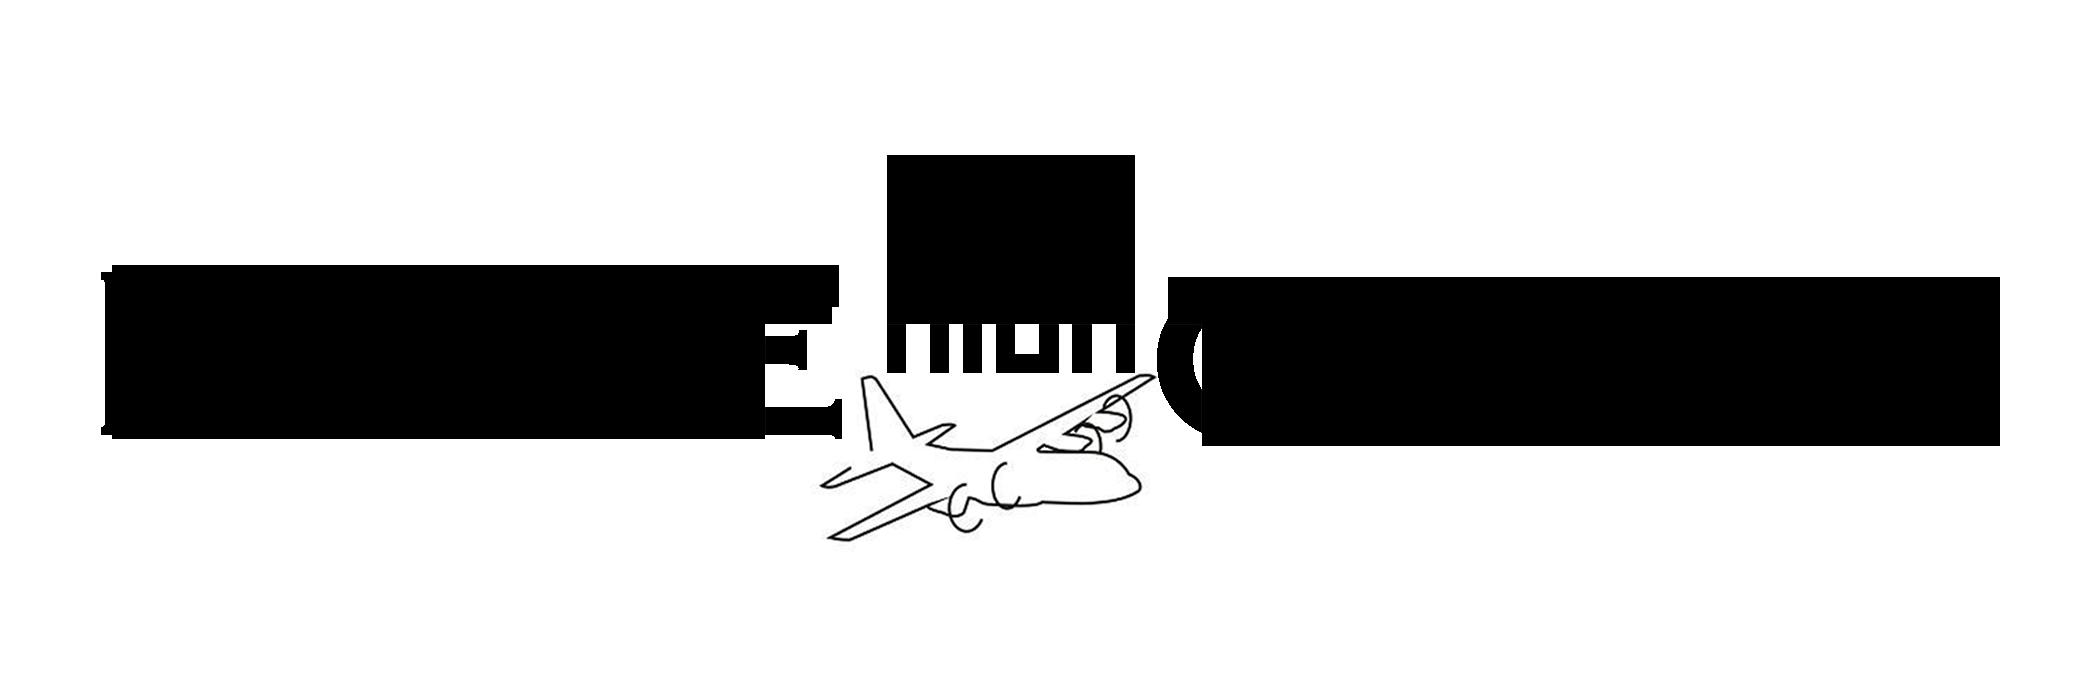 Mile High Club Logo design